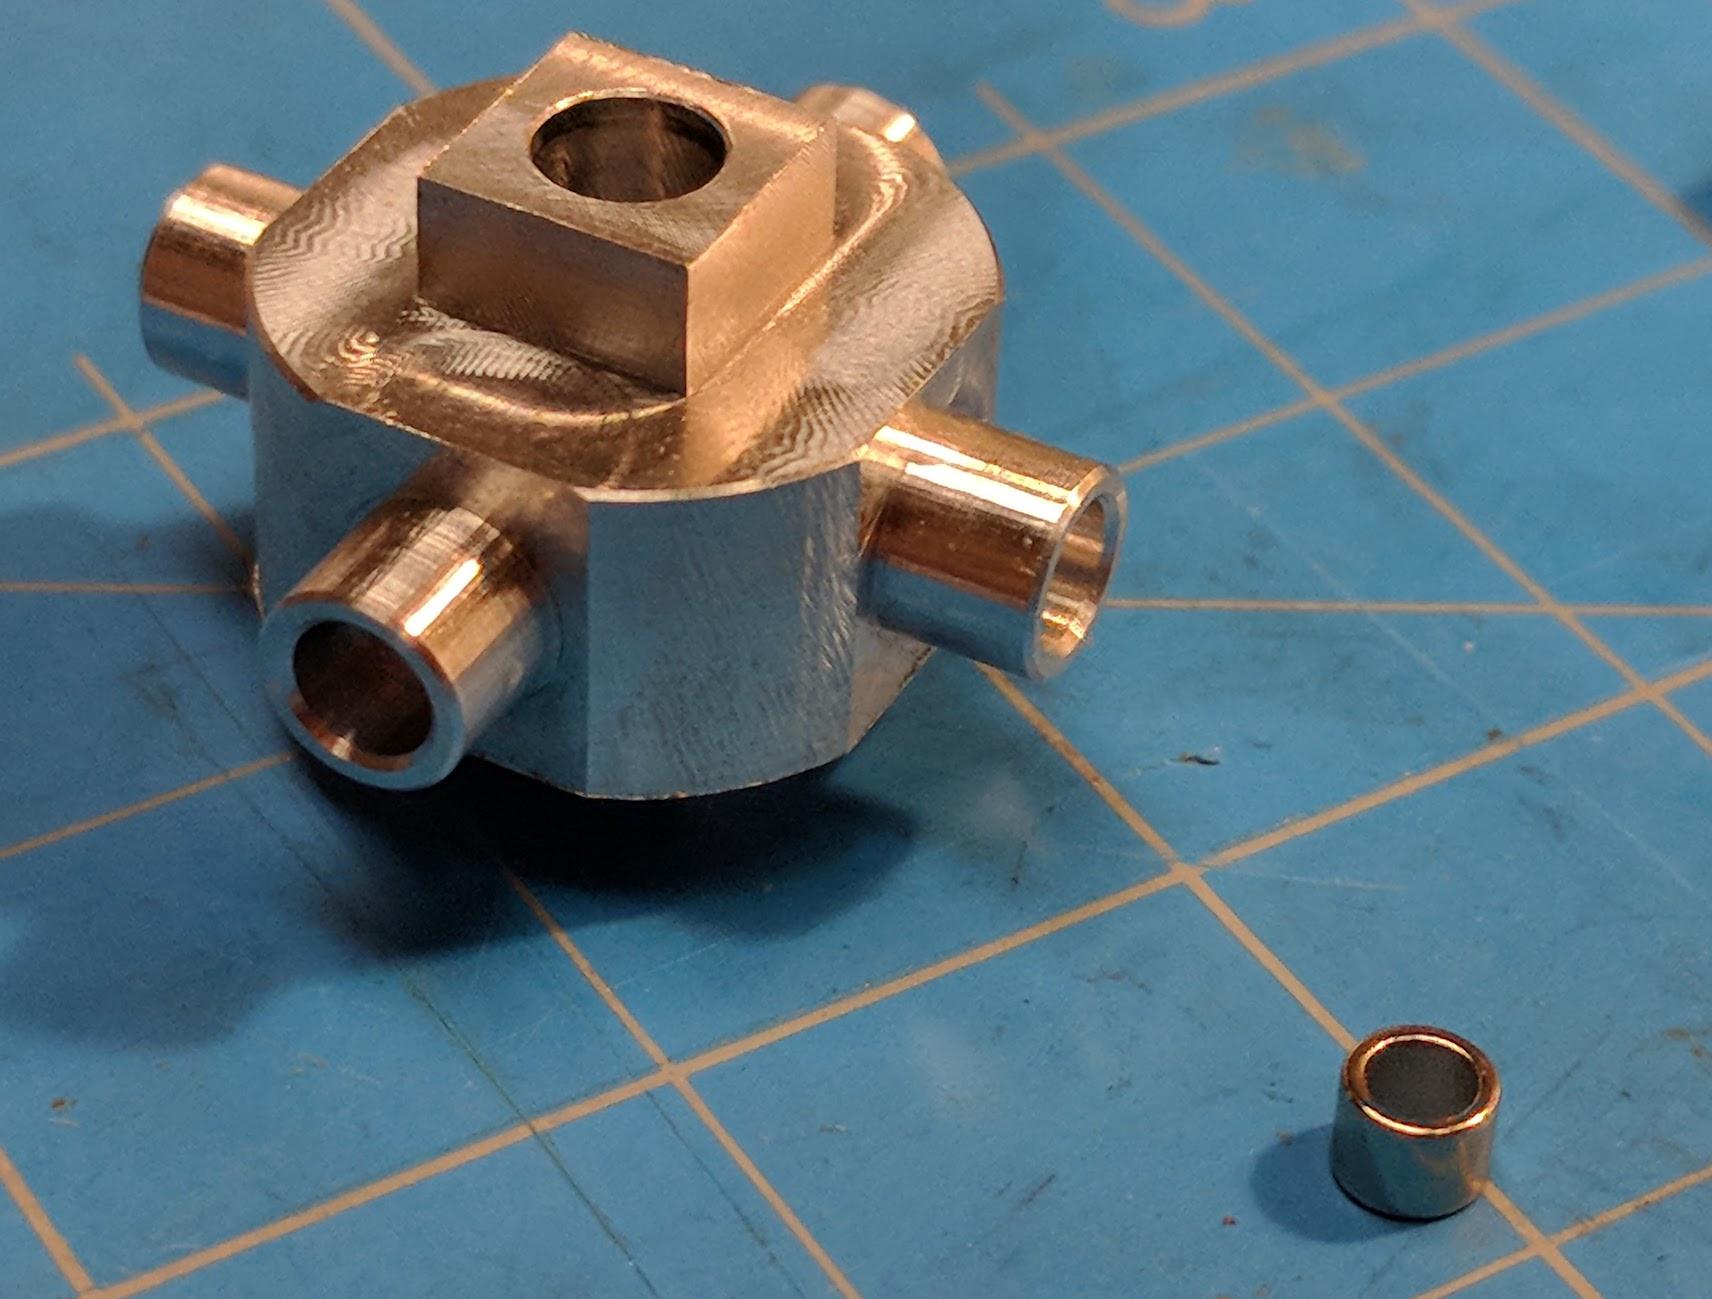 v2/carrier-with-magnet.jpg